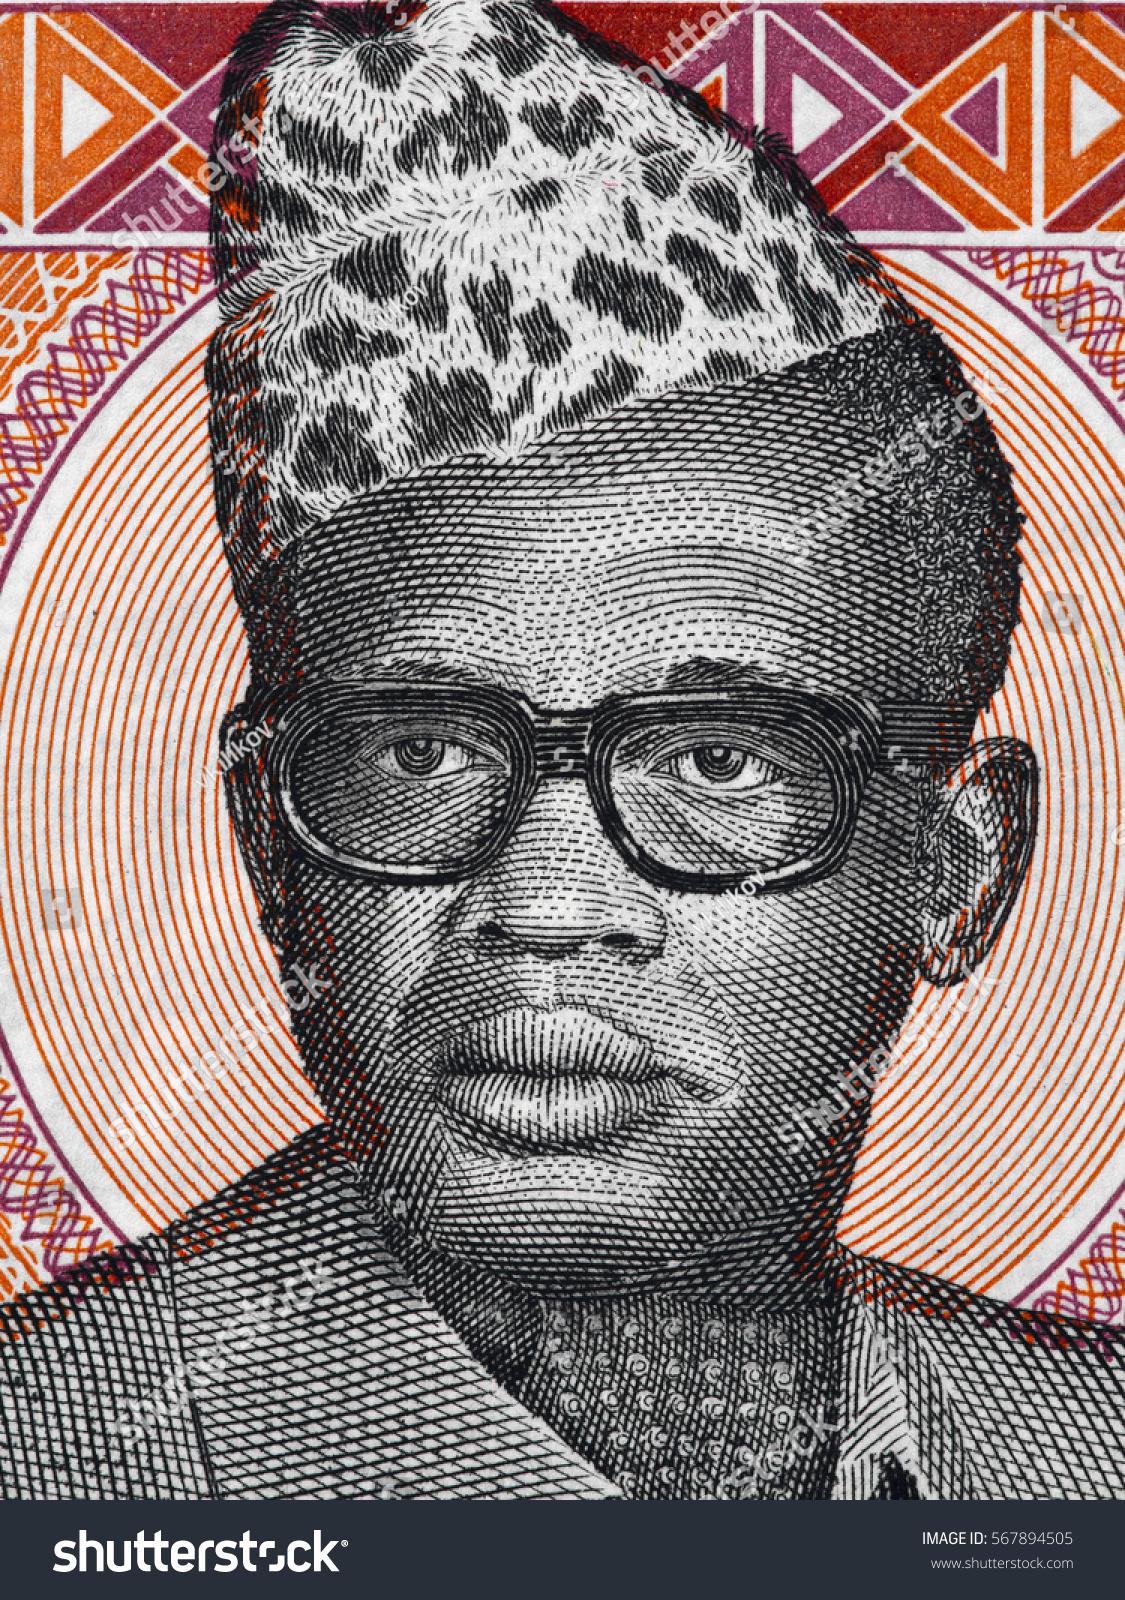 Dictators and football. King of Zaire Mobutu Sese Seko